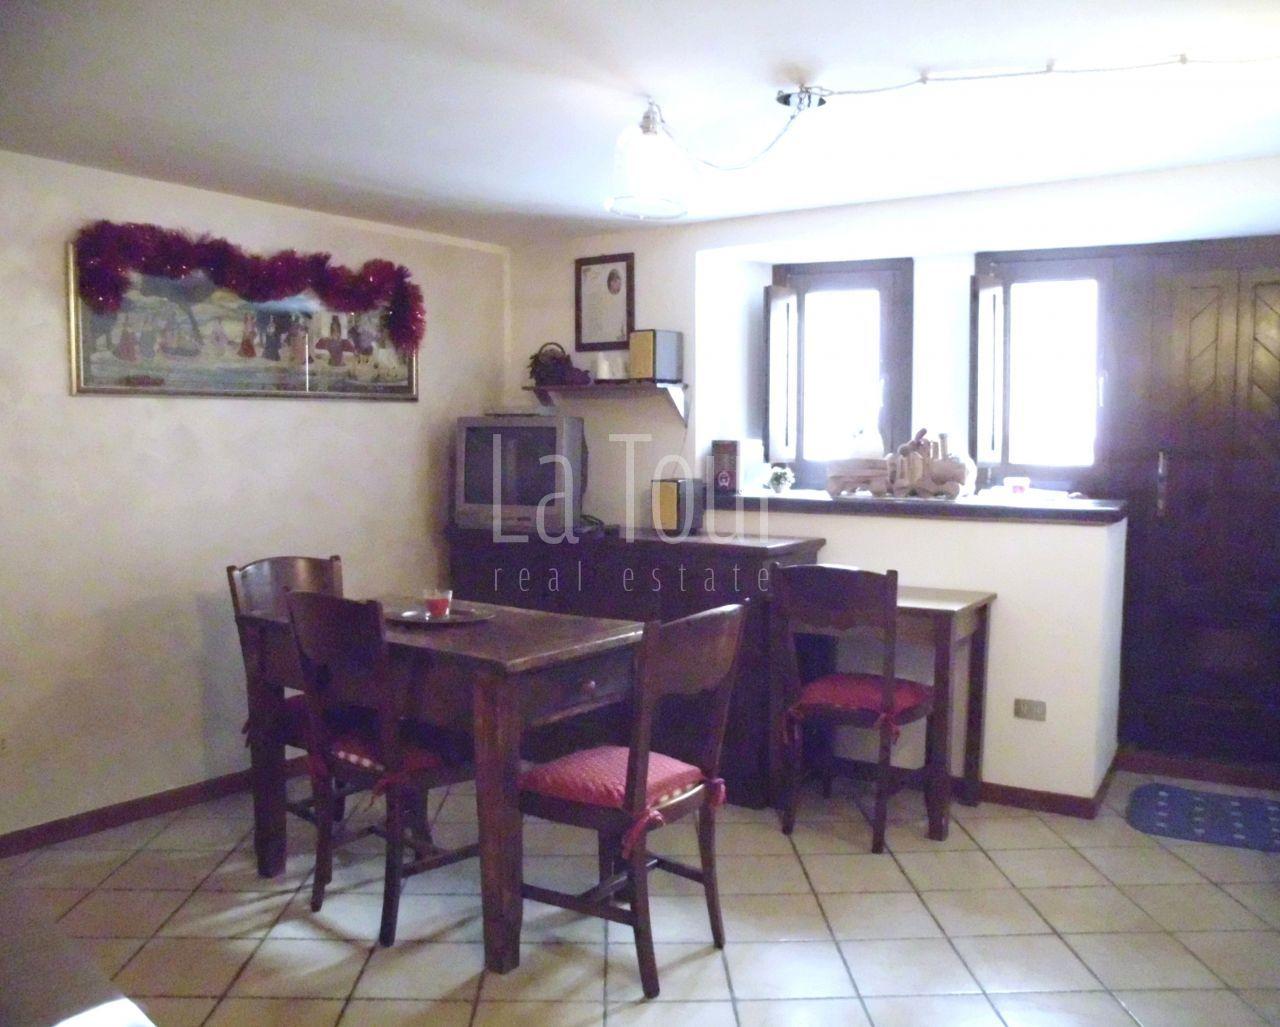 Appartamenti in vendita affitto a aosta i migliori - Immobili categoria a1 ...